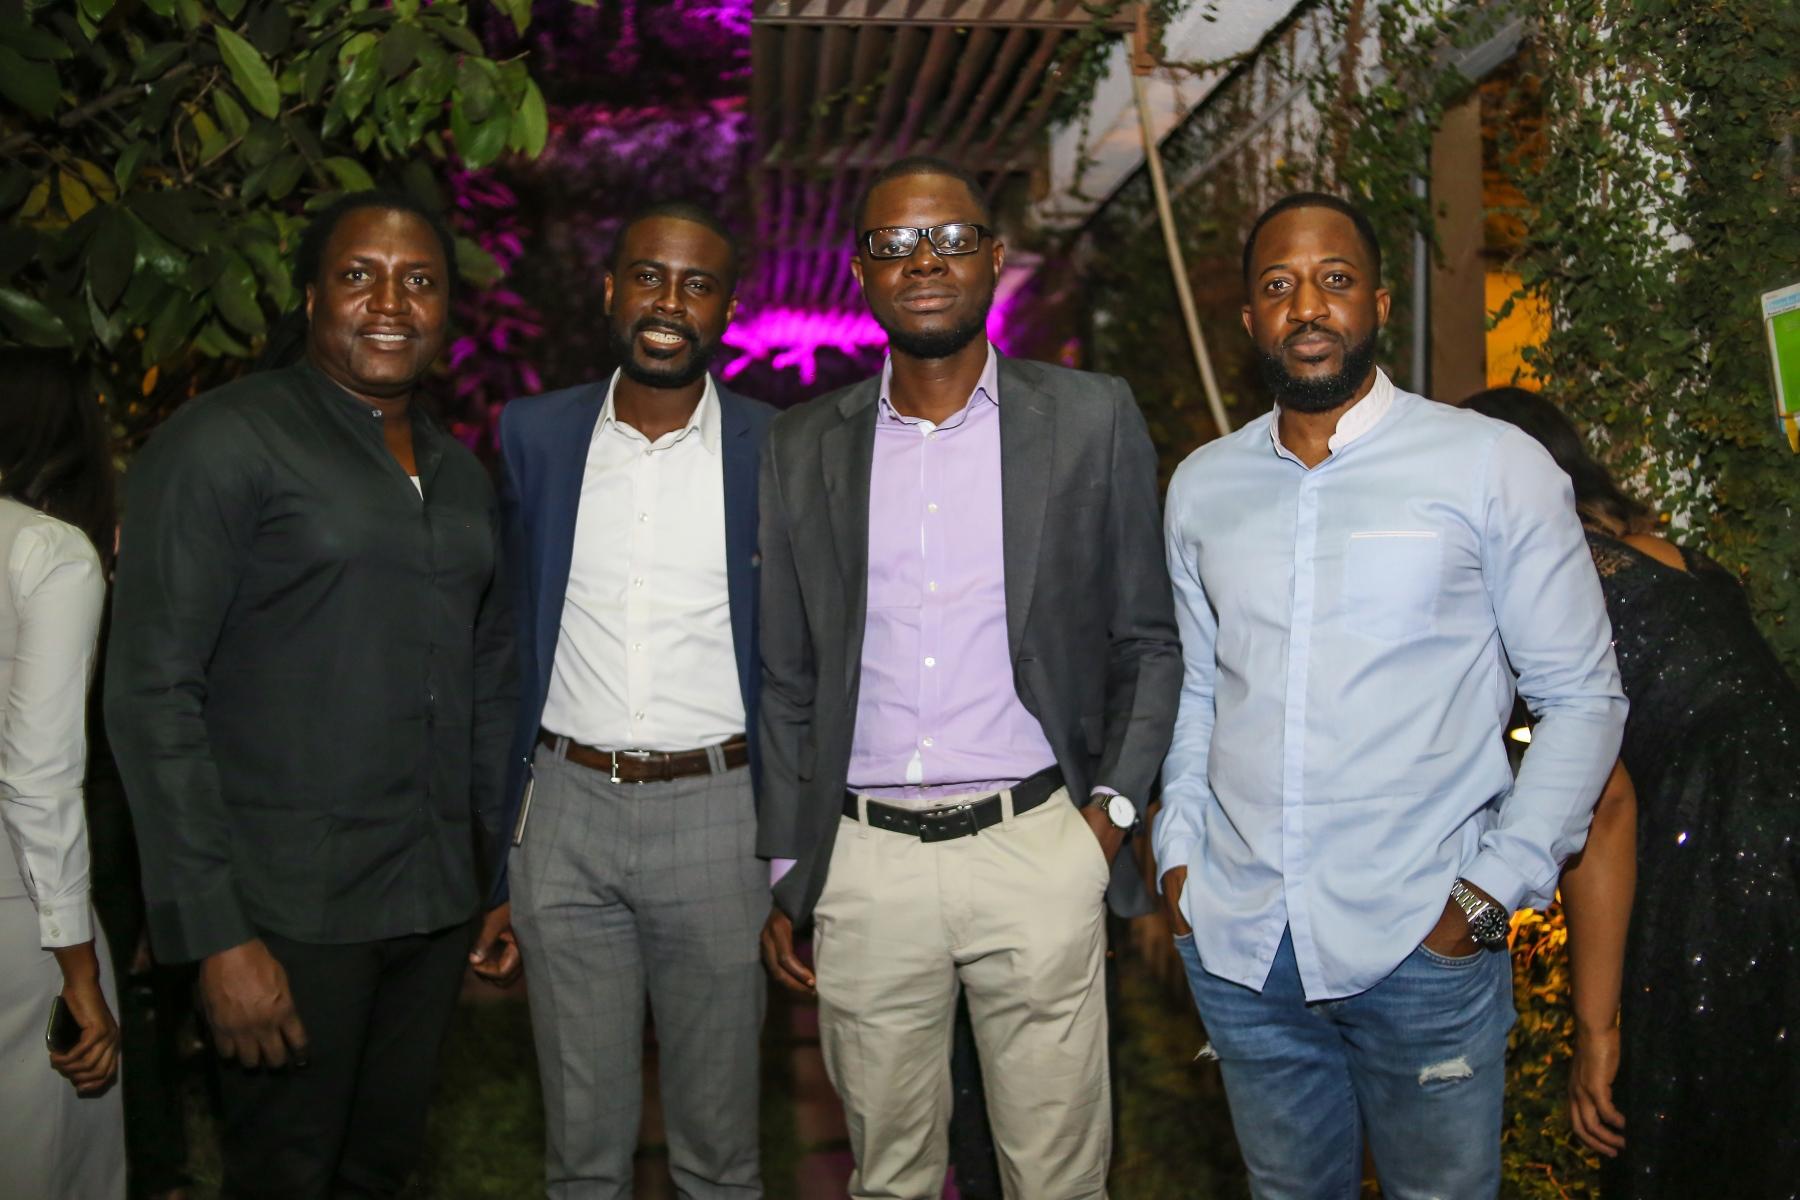 Steve Baba-Eko (Founder, X3M Group), Oluseye Soyode-Johnson (Founder, The African Technology Foundation), Oluyomi Ojo (Founder, Printivo), Olaotan Towry-Coker (Founder, AfriTickets.com and Cranium One)